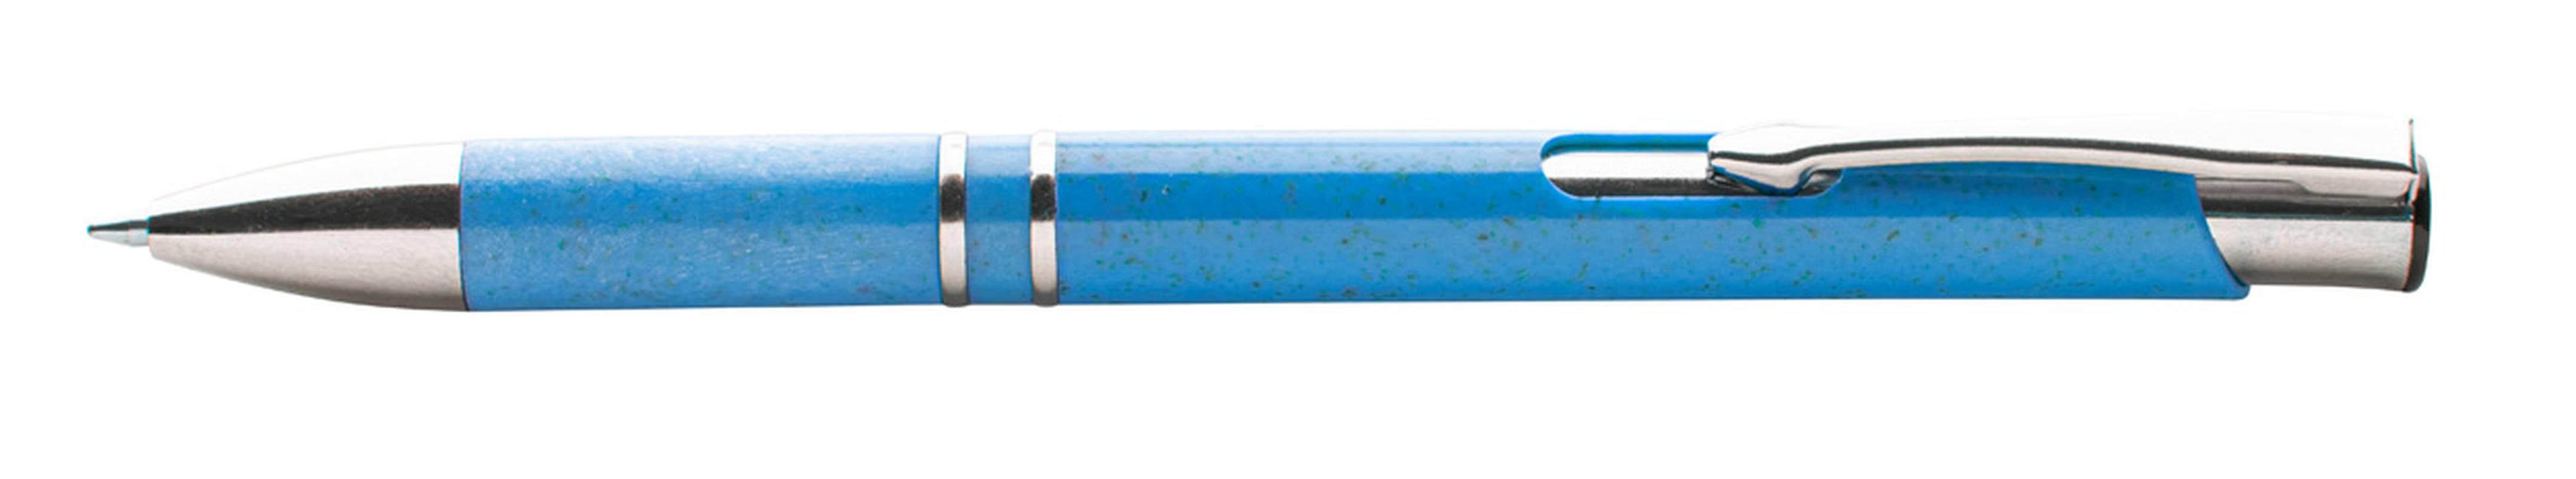 Nukot kuličkové pero